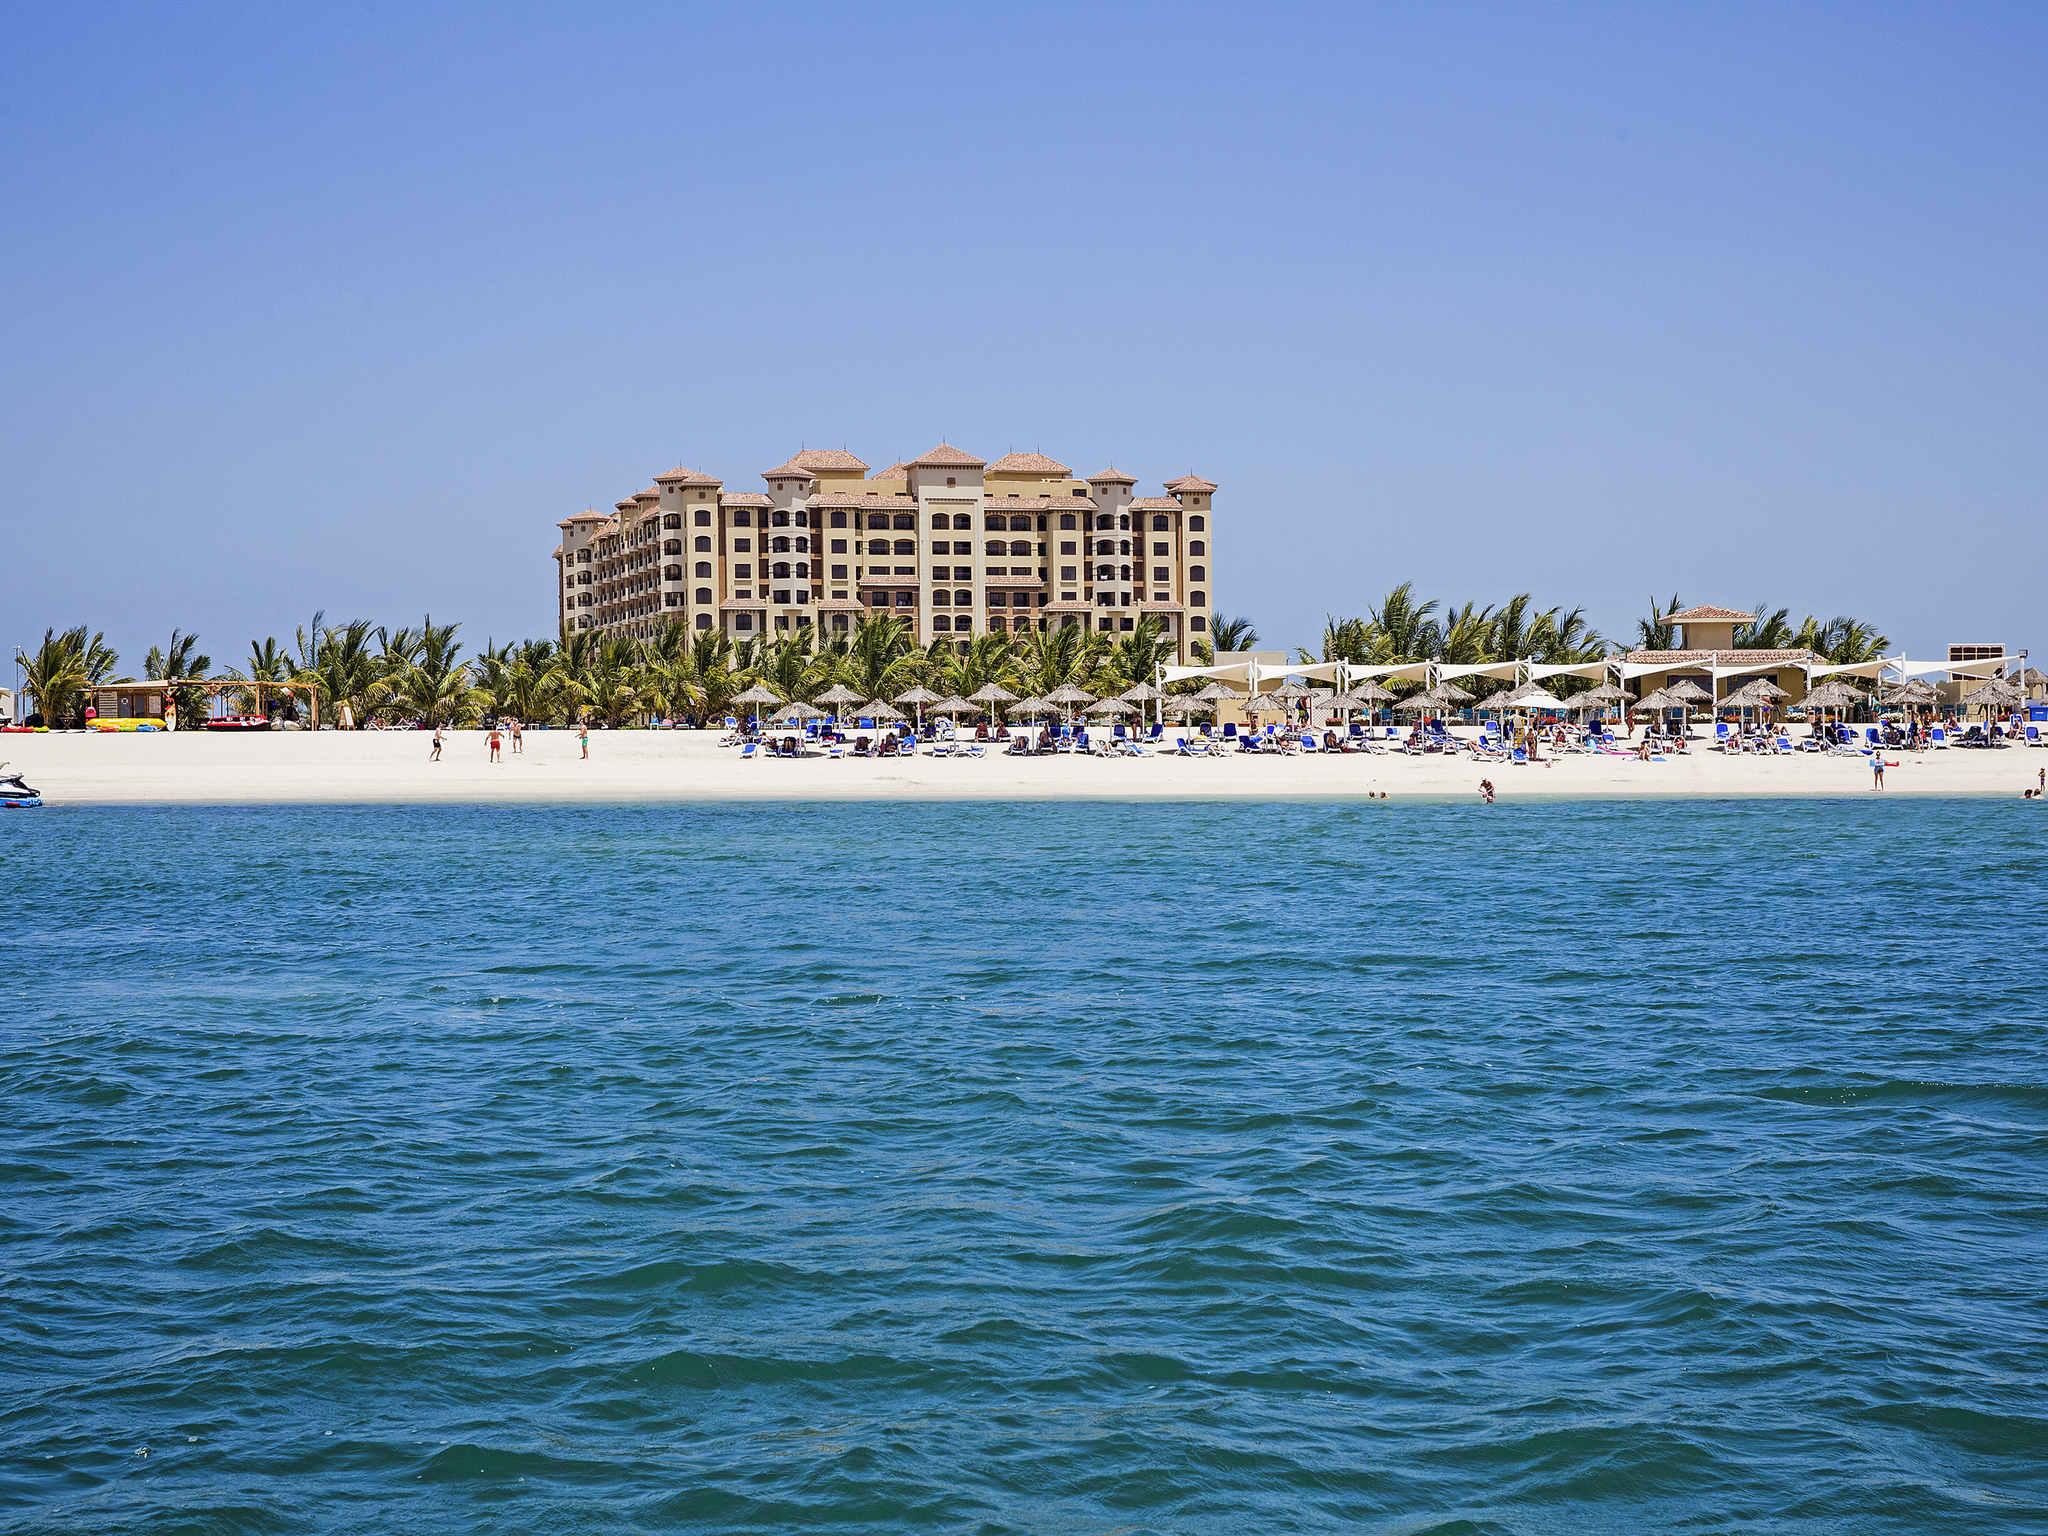 Hotel – Marjan Island Resort & Spa - Managed by AccorHotels